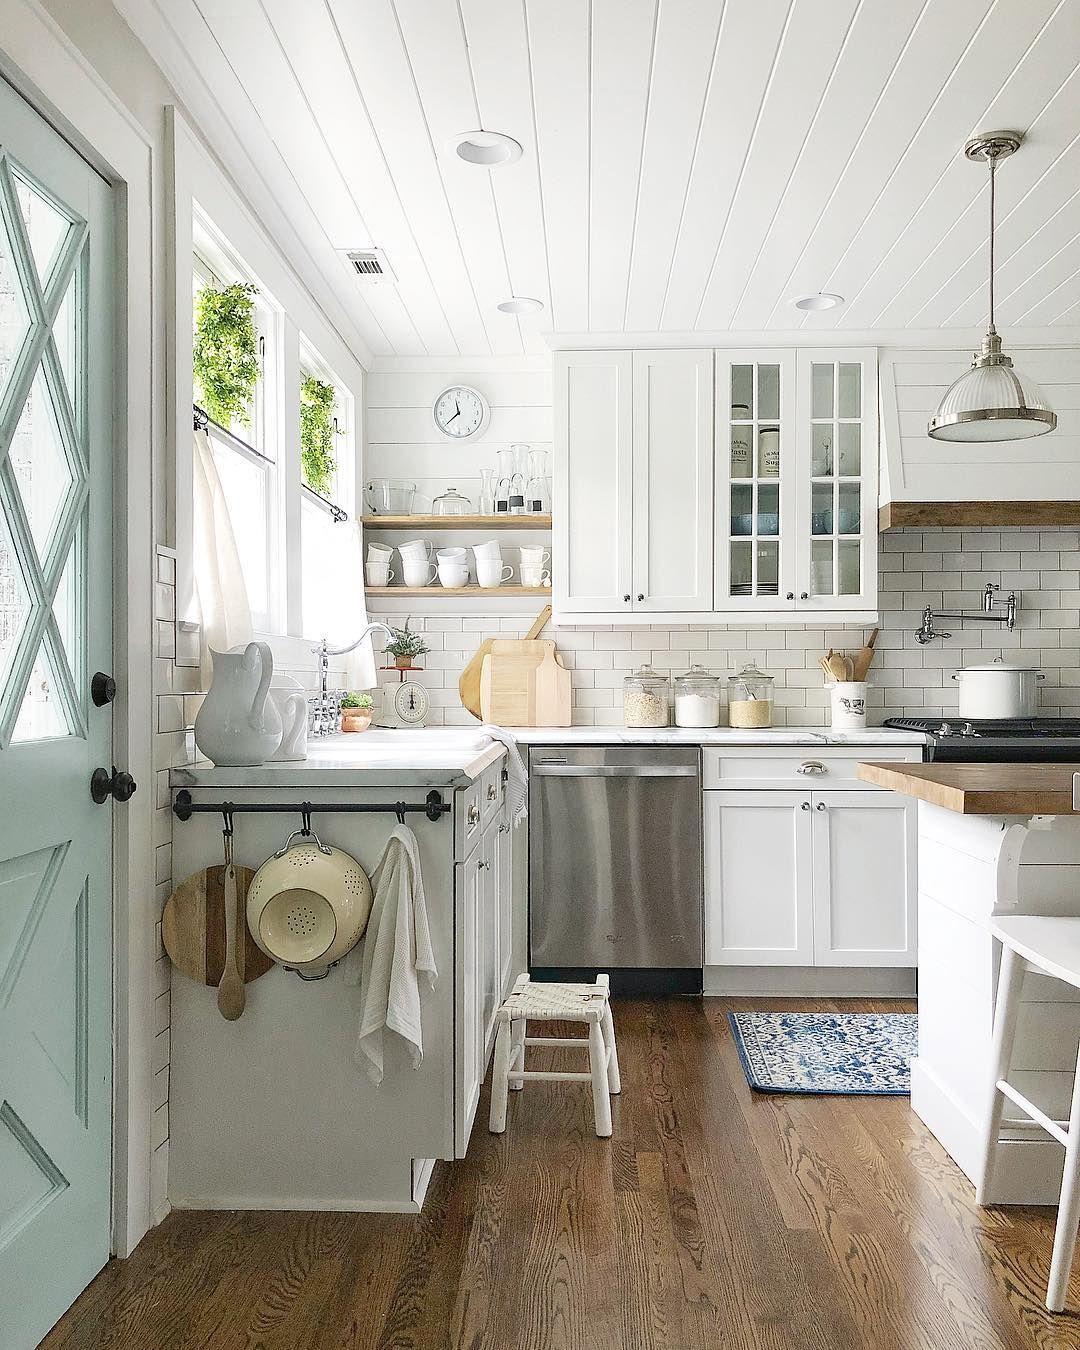 Pin by amandadalton on kitchens pinterest kitchens yards and